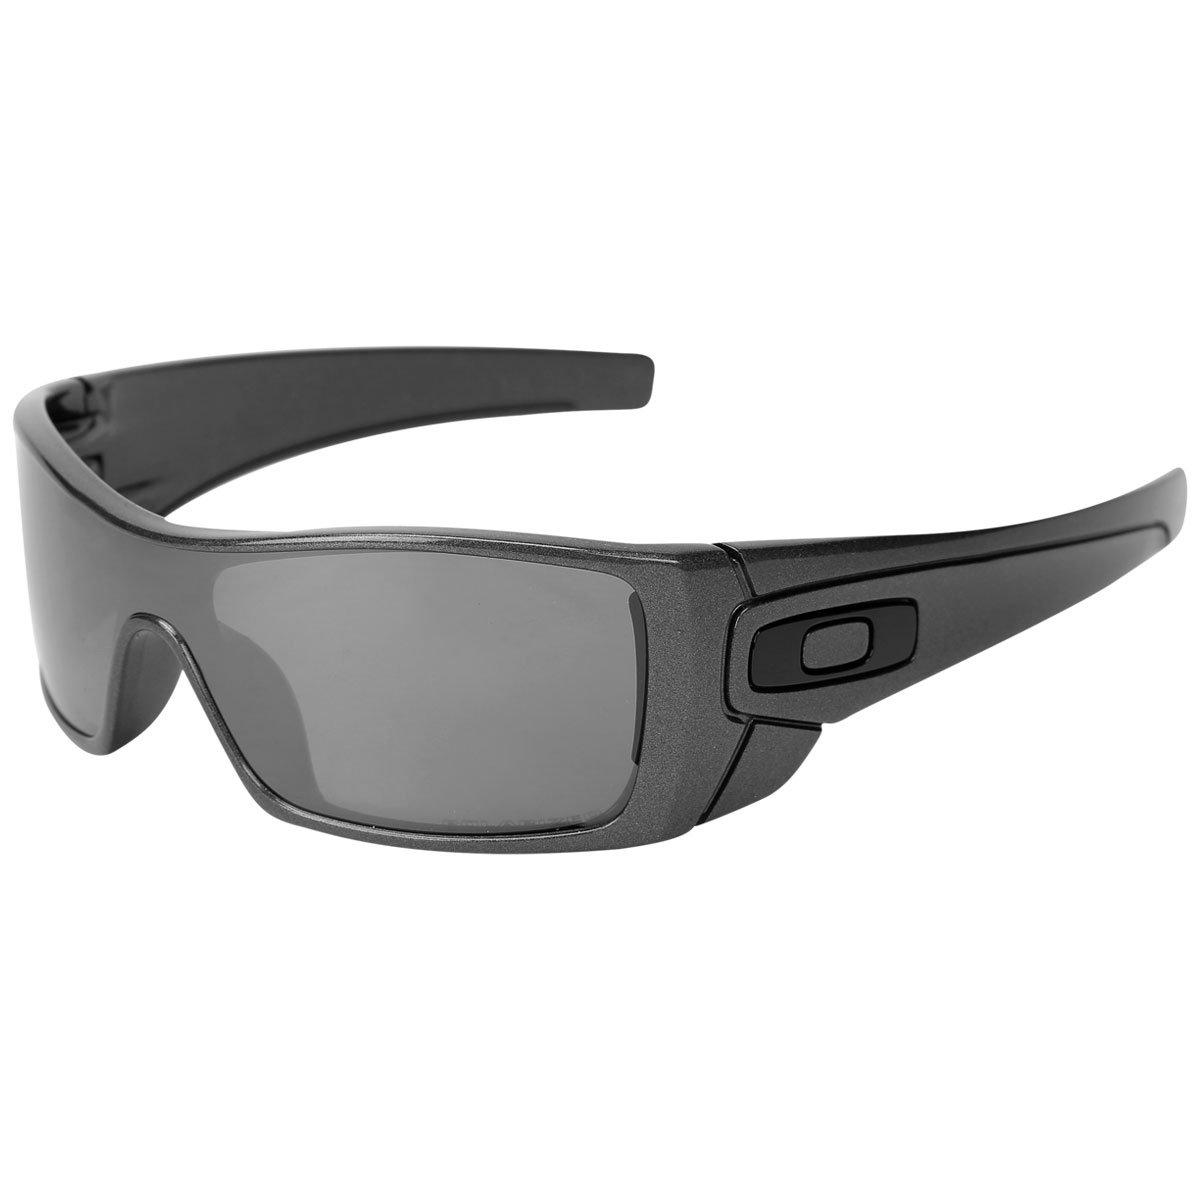 9f1b7640b1775 Óculos de Sol Oakley Batwolf Iridium - Compre Agora